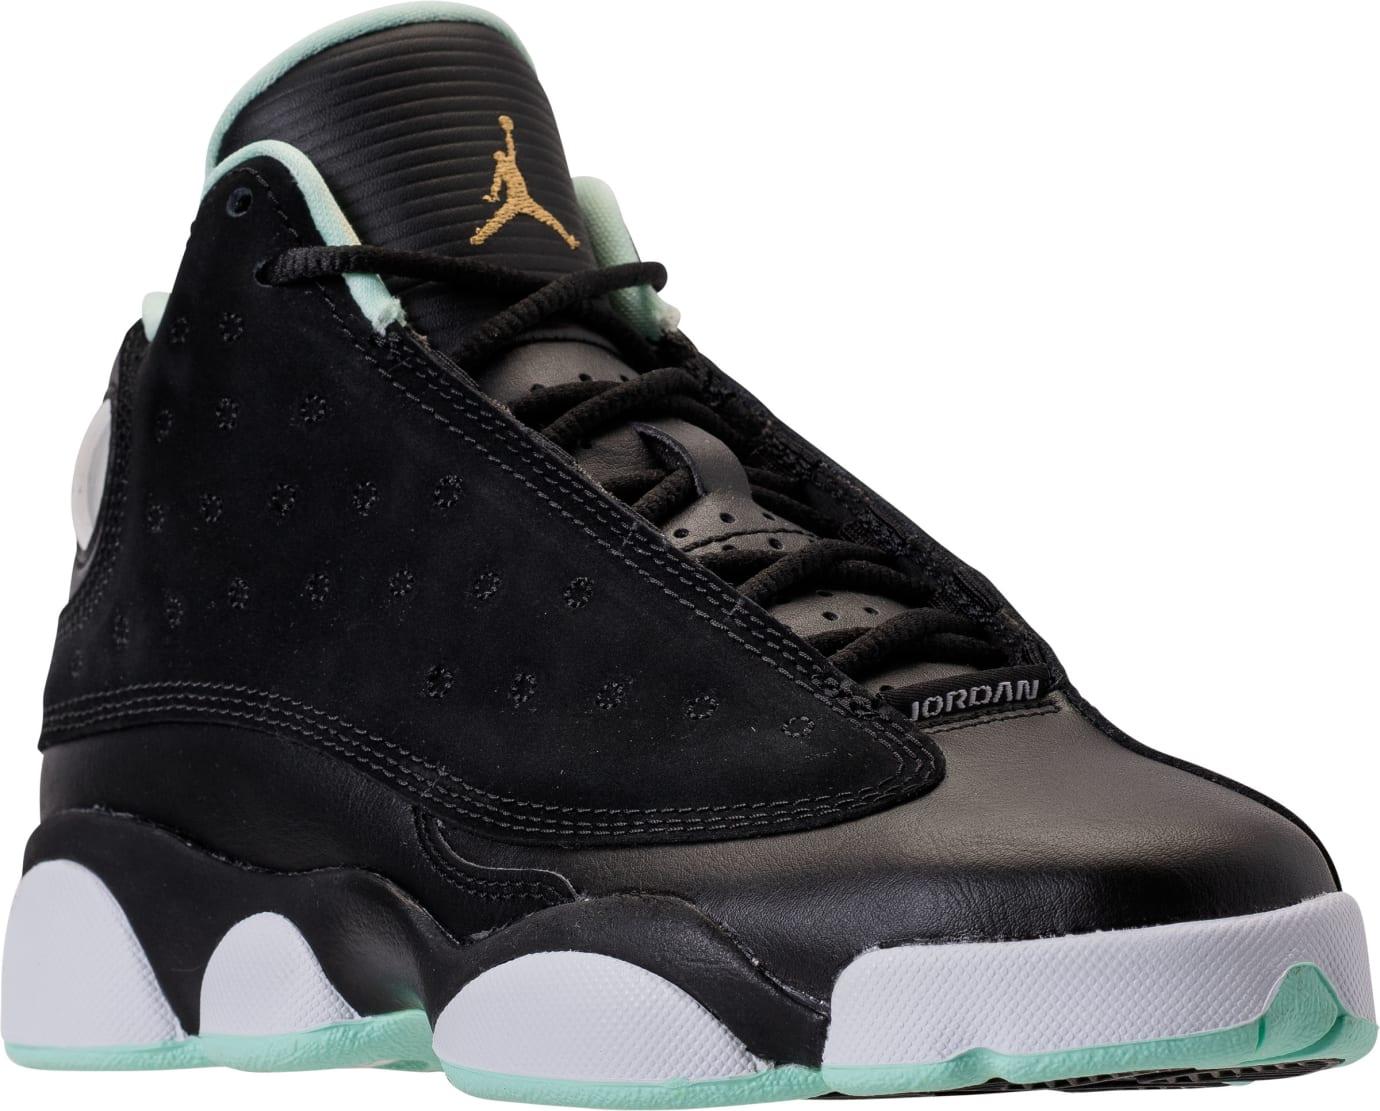 abf8ce41faa Air Jordan 13 GS Mint Foam Release Date 439358-015 | Sole Collector